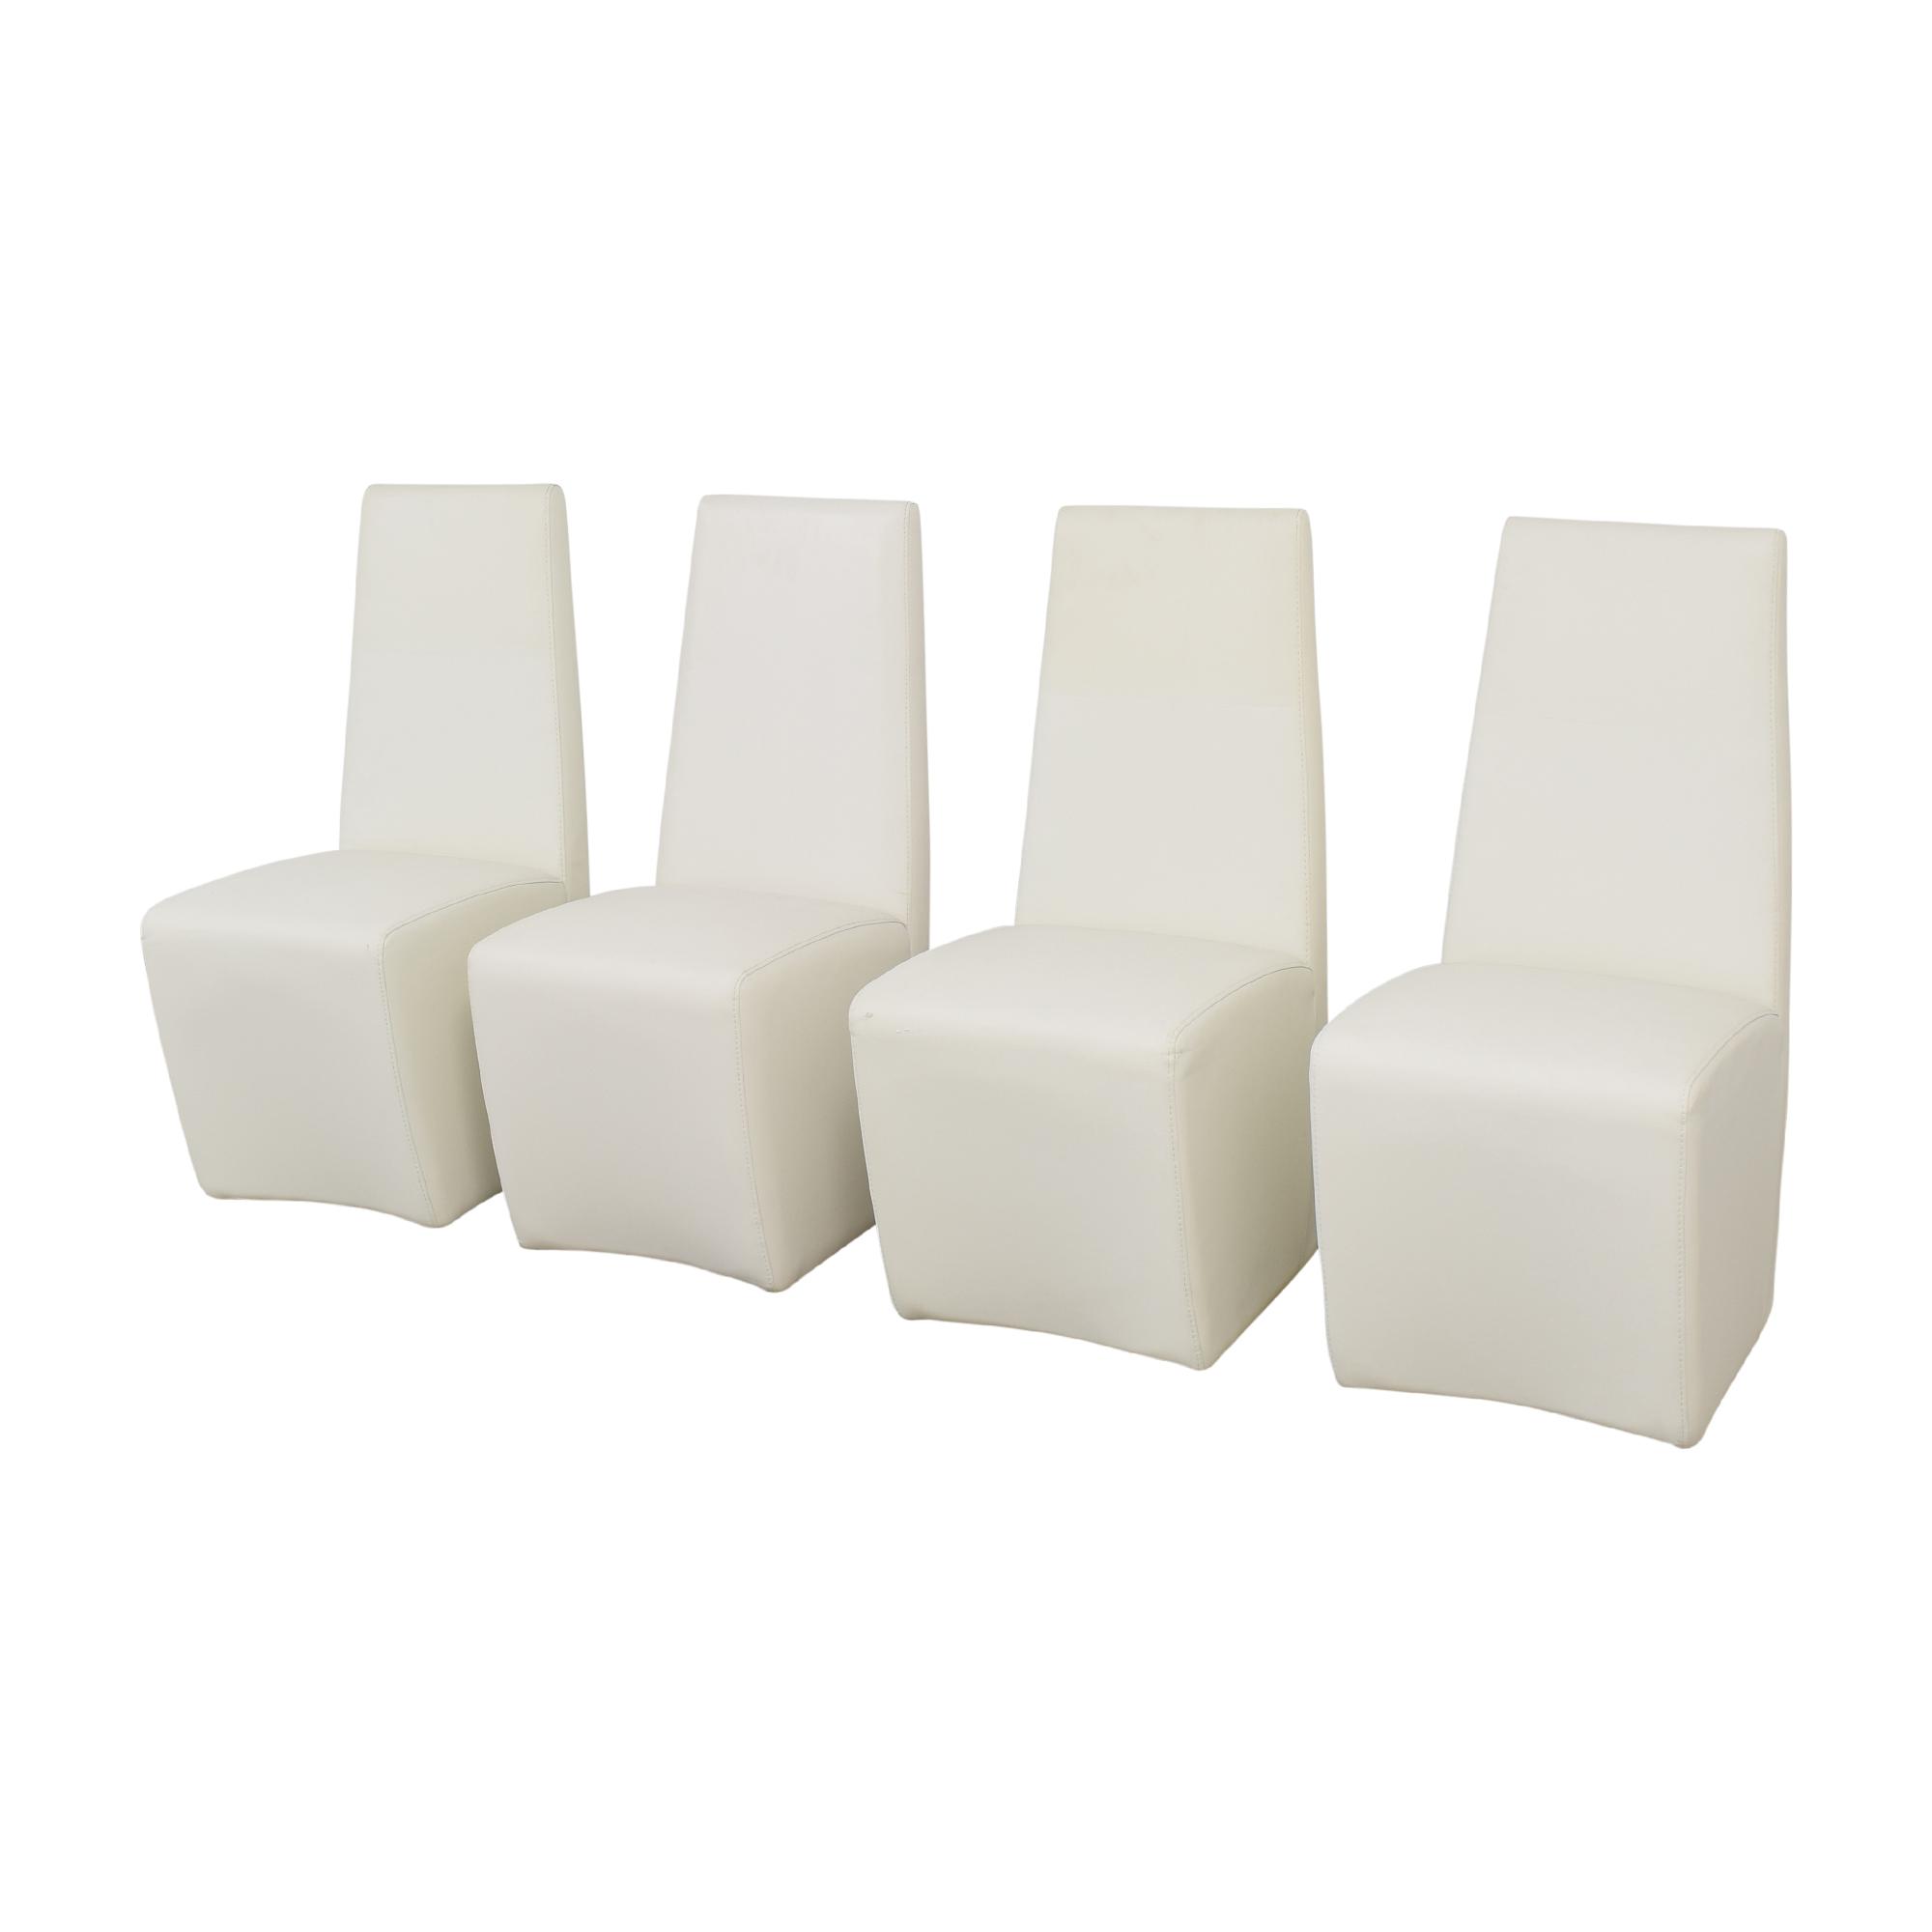 Star Furniture Star Furniture Ritz by Essentials Tobi Dining Side Chairs